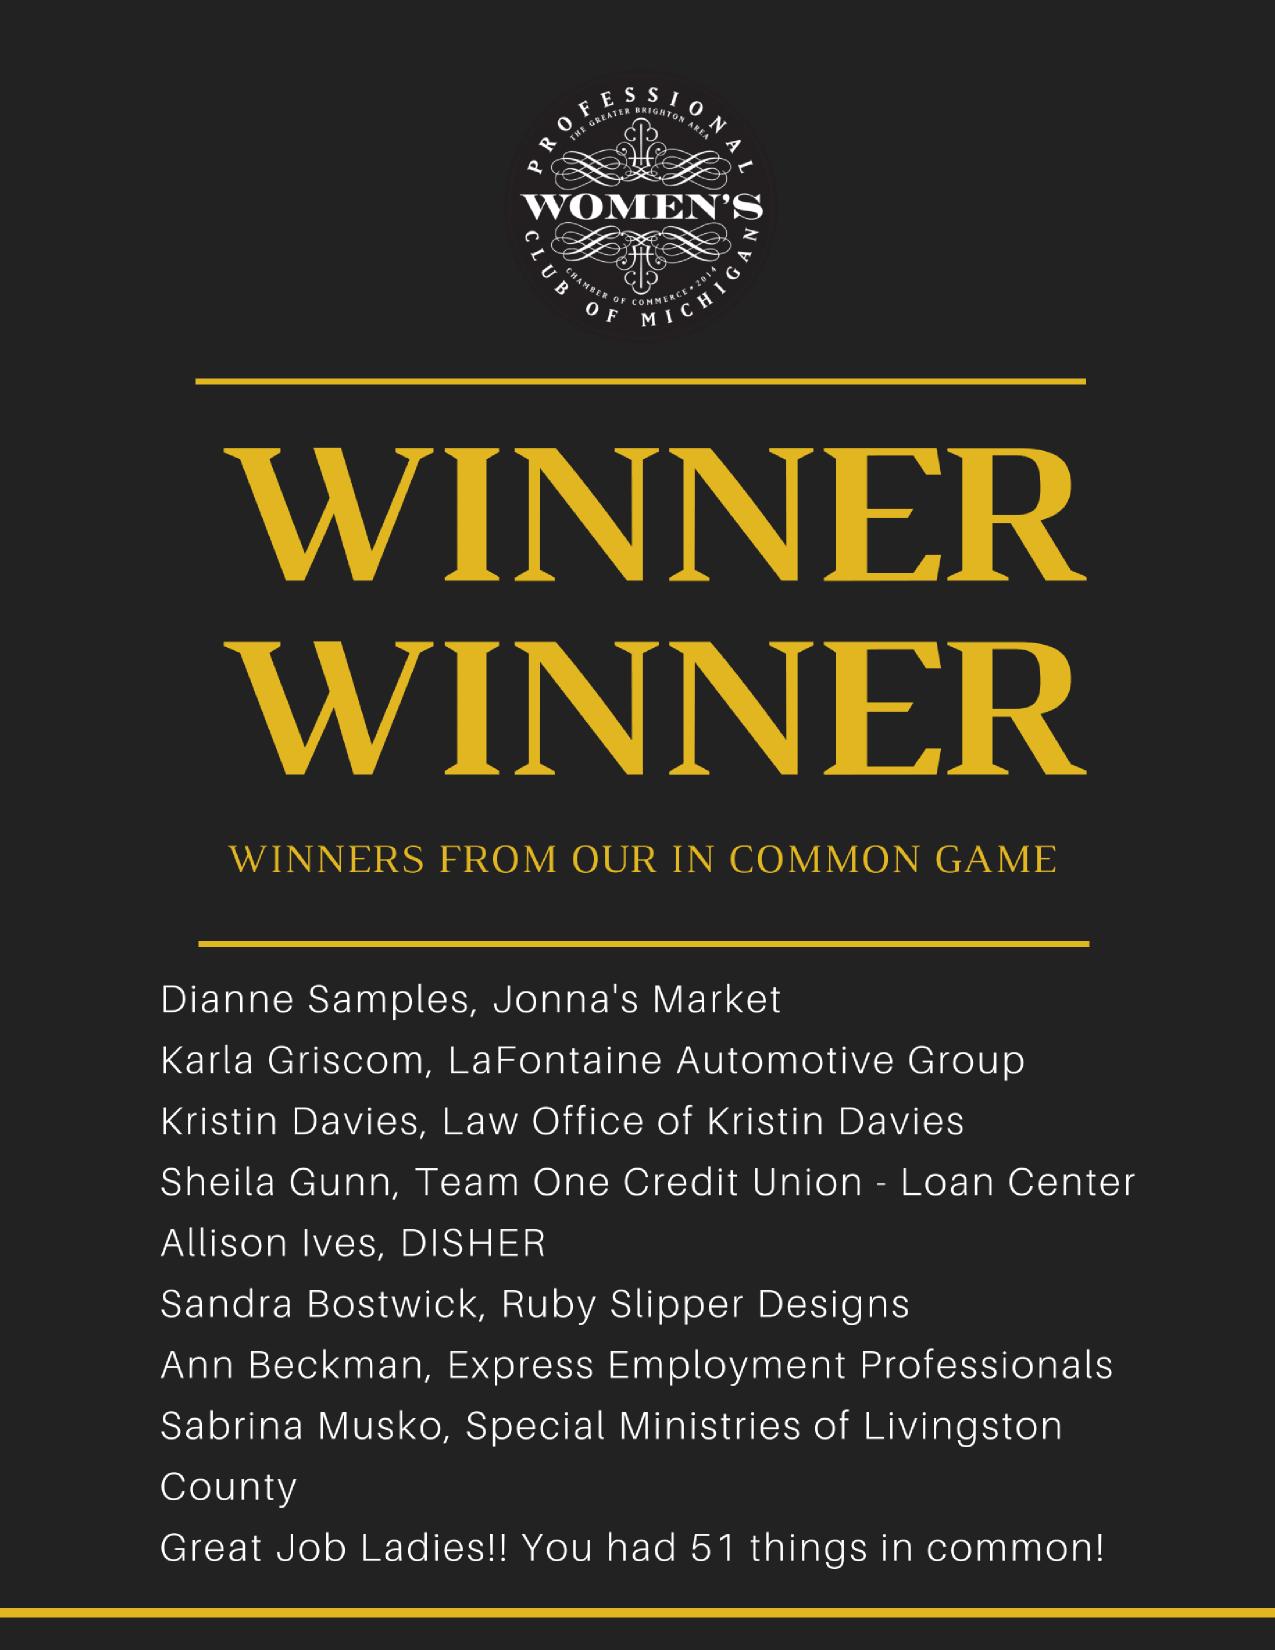 PWCM_Winners-w1275.png